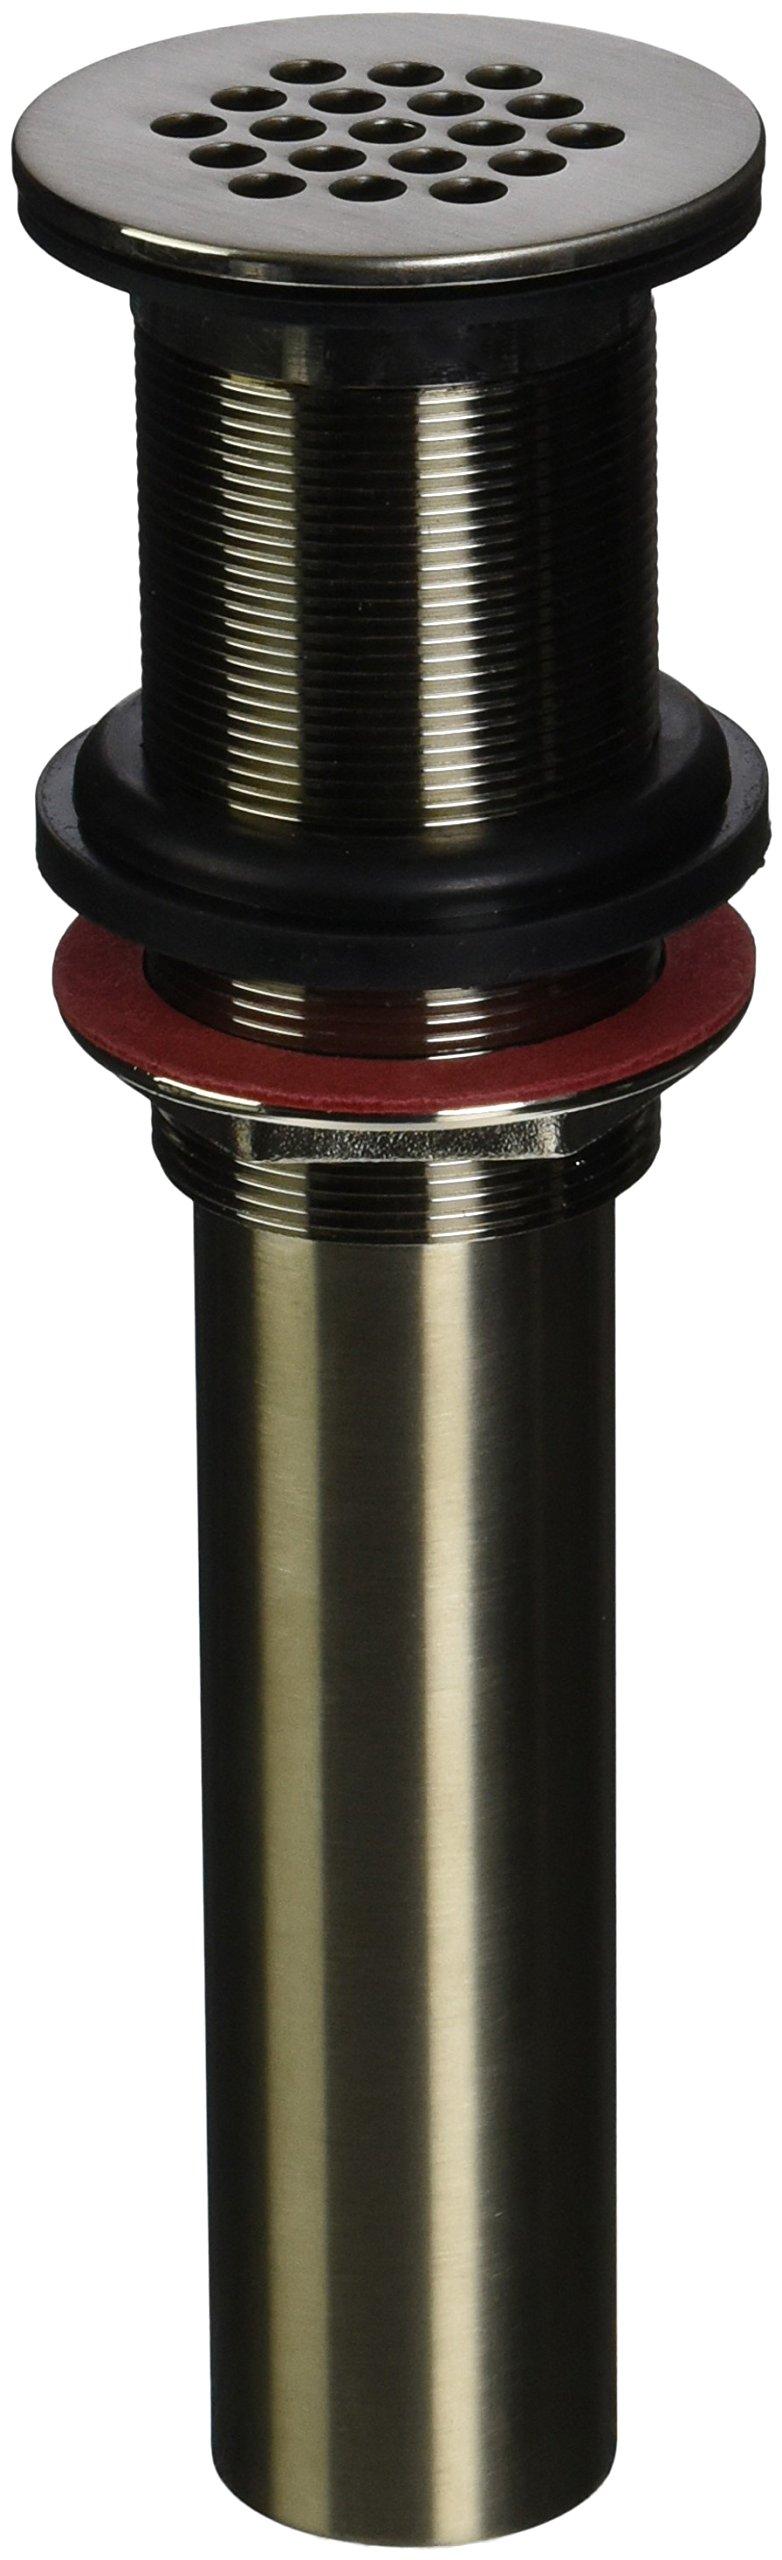 Pfister T47-7GLK Lavatory Grid Strainer, Brushed Nickel